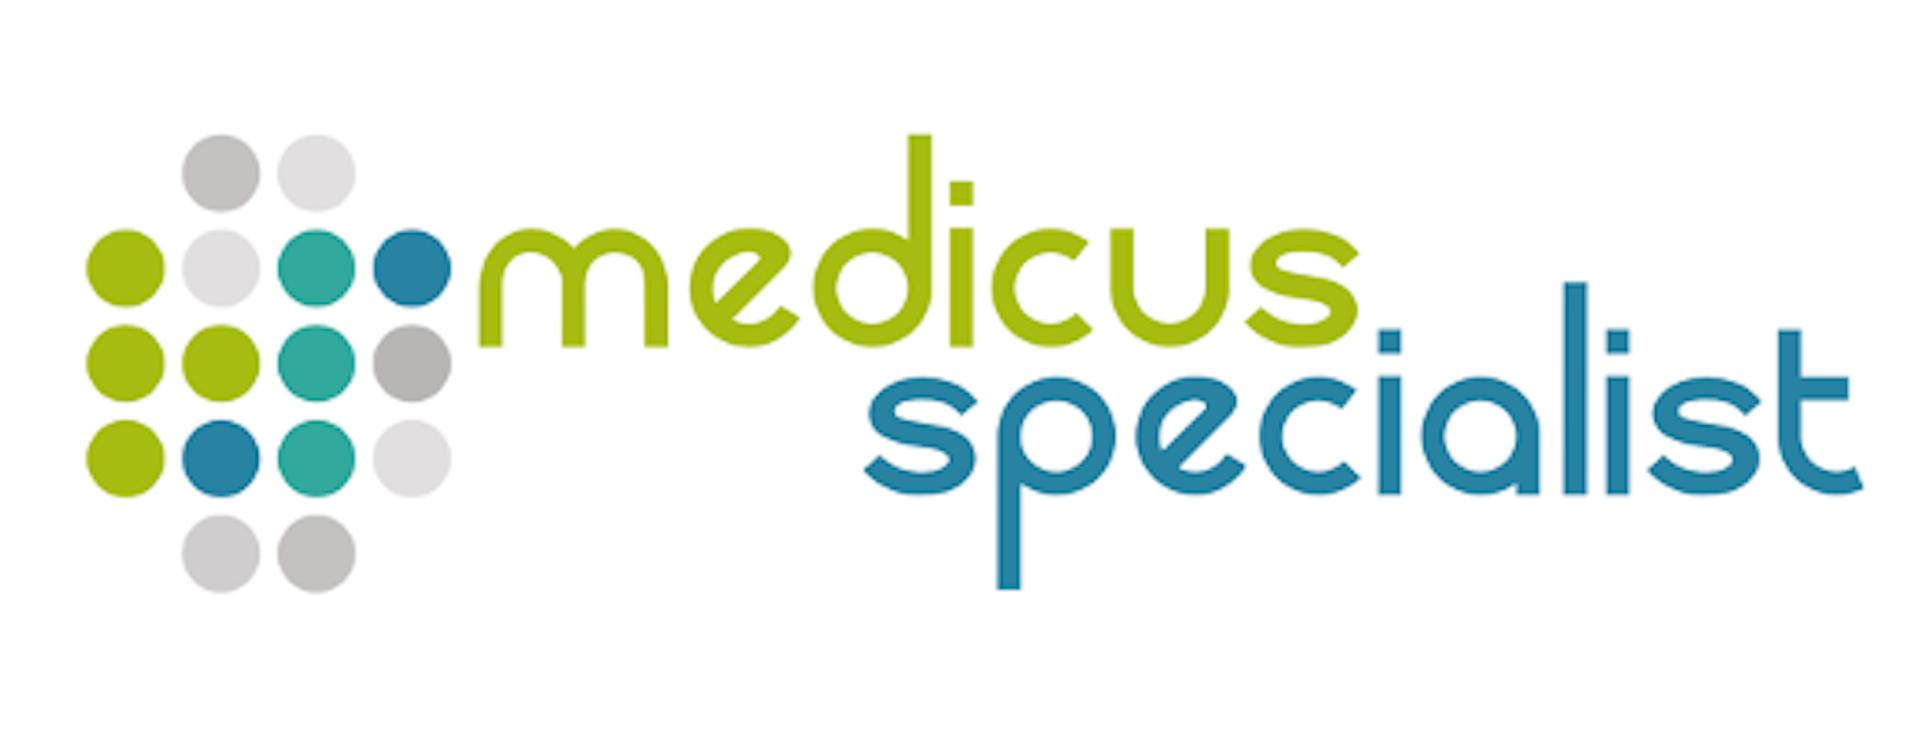 Medicusspecialist